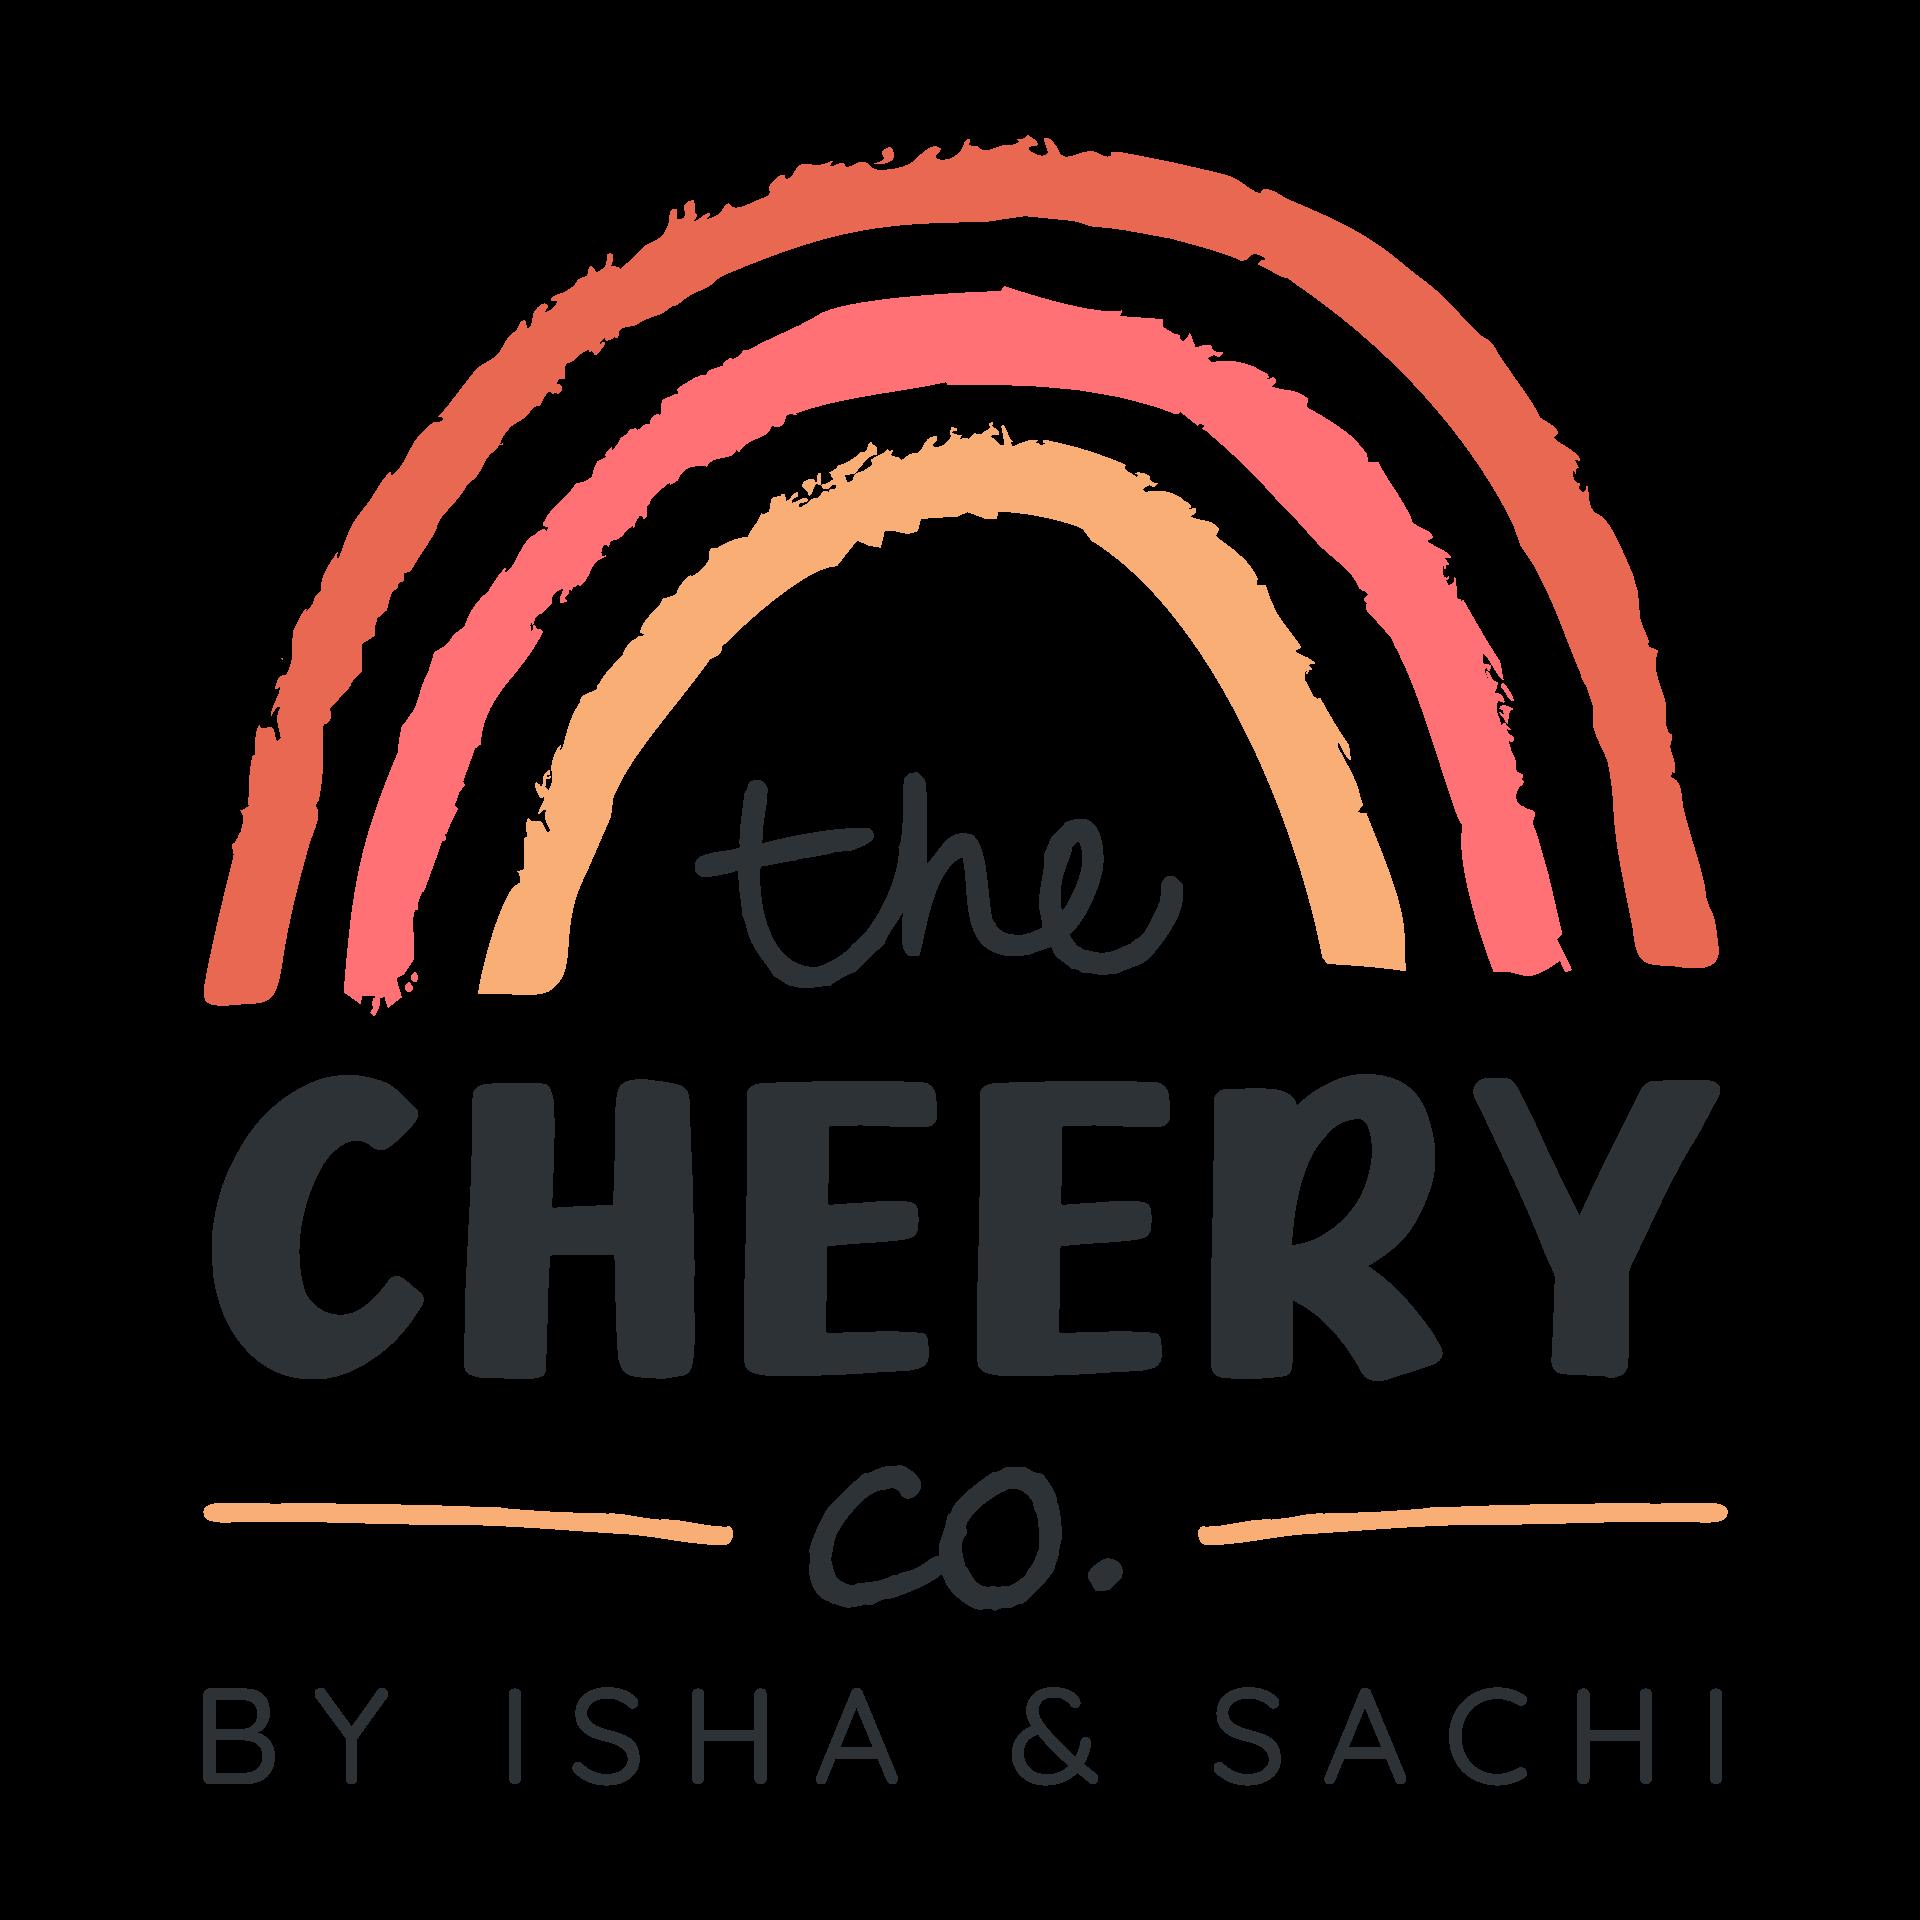 Sachi Chowdhry